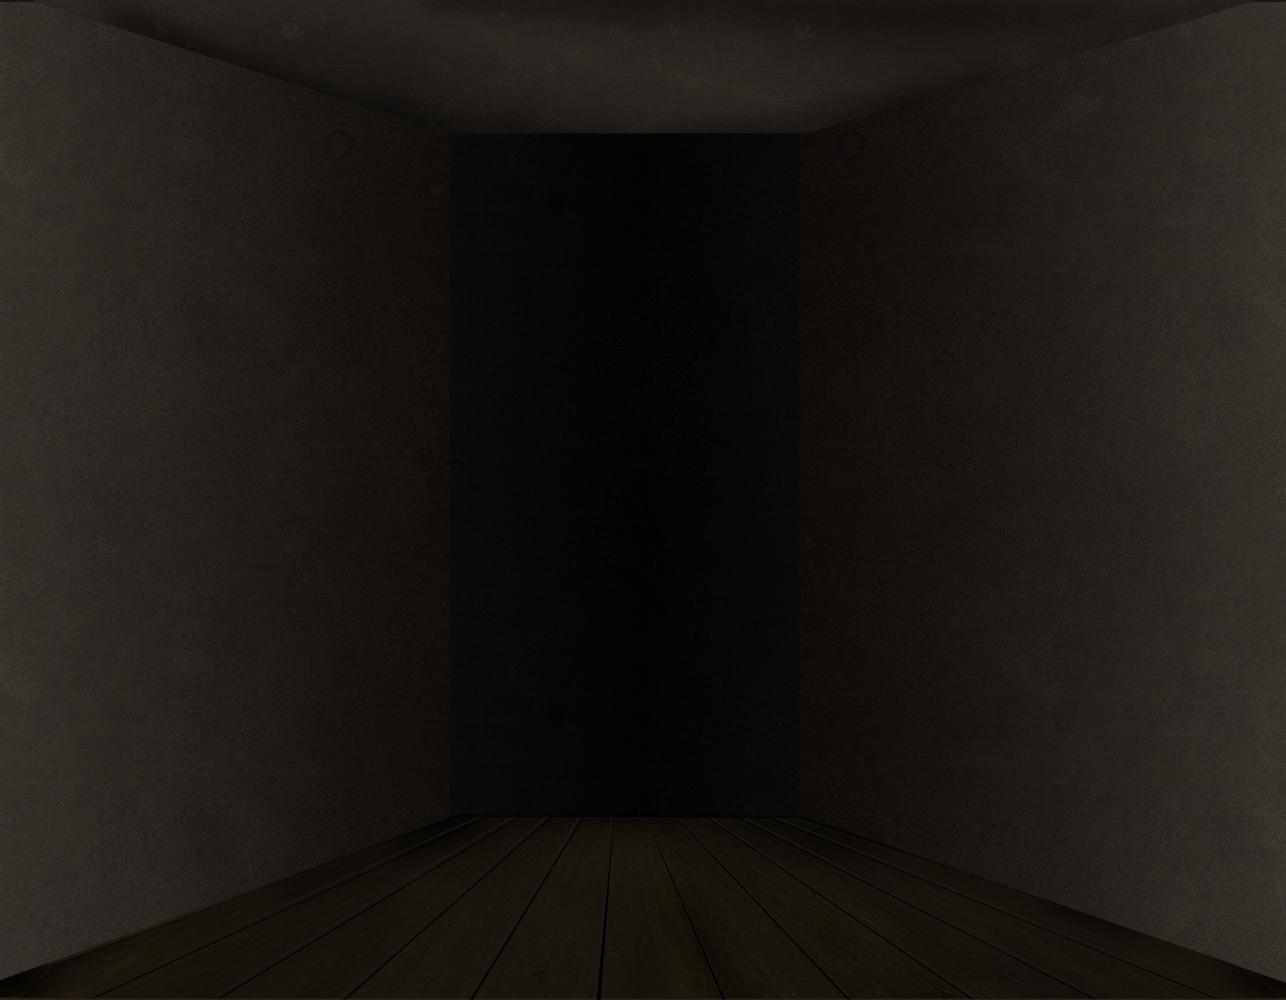 ♕ SPIRIT BRINGERS: EMPYREAN REALM. (SAGA DE DENEB) - Página 6 Dark_room_background_by_chaosstocks